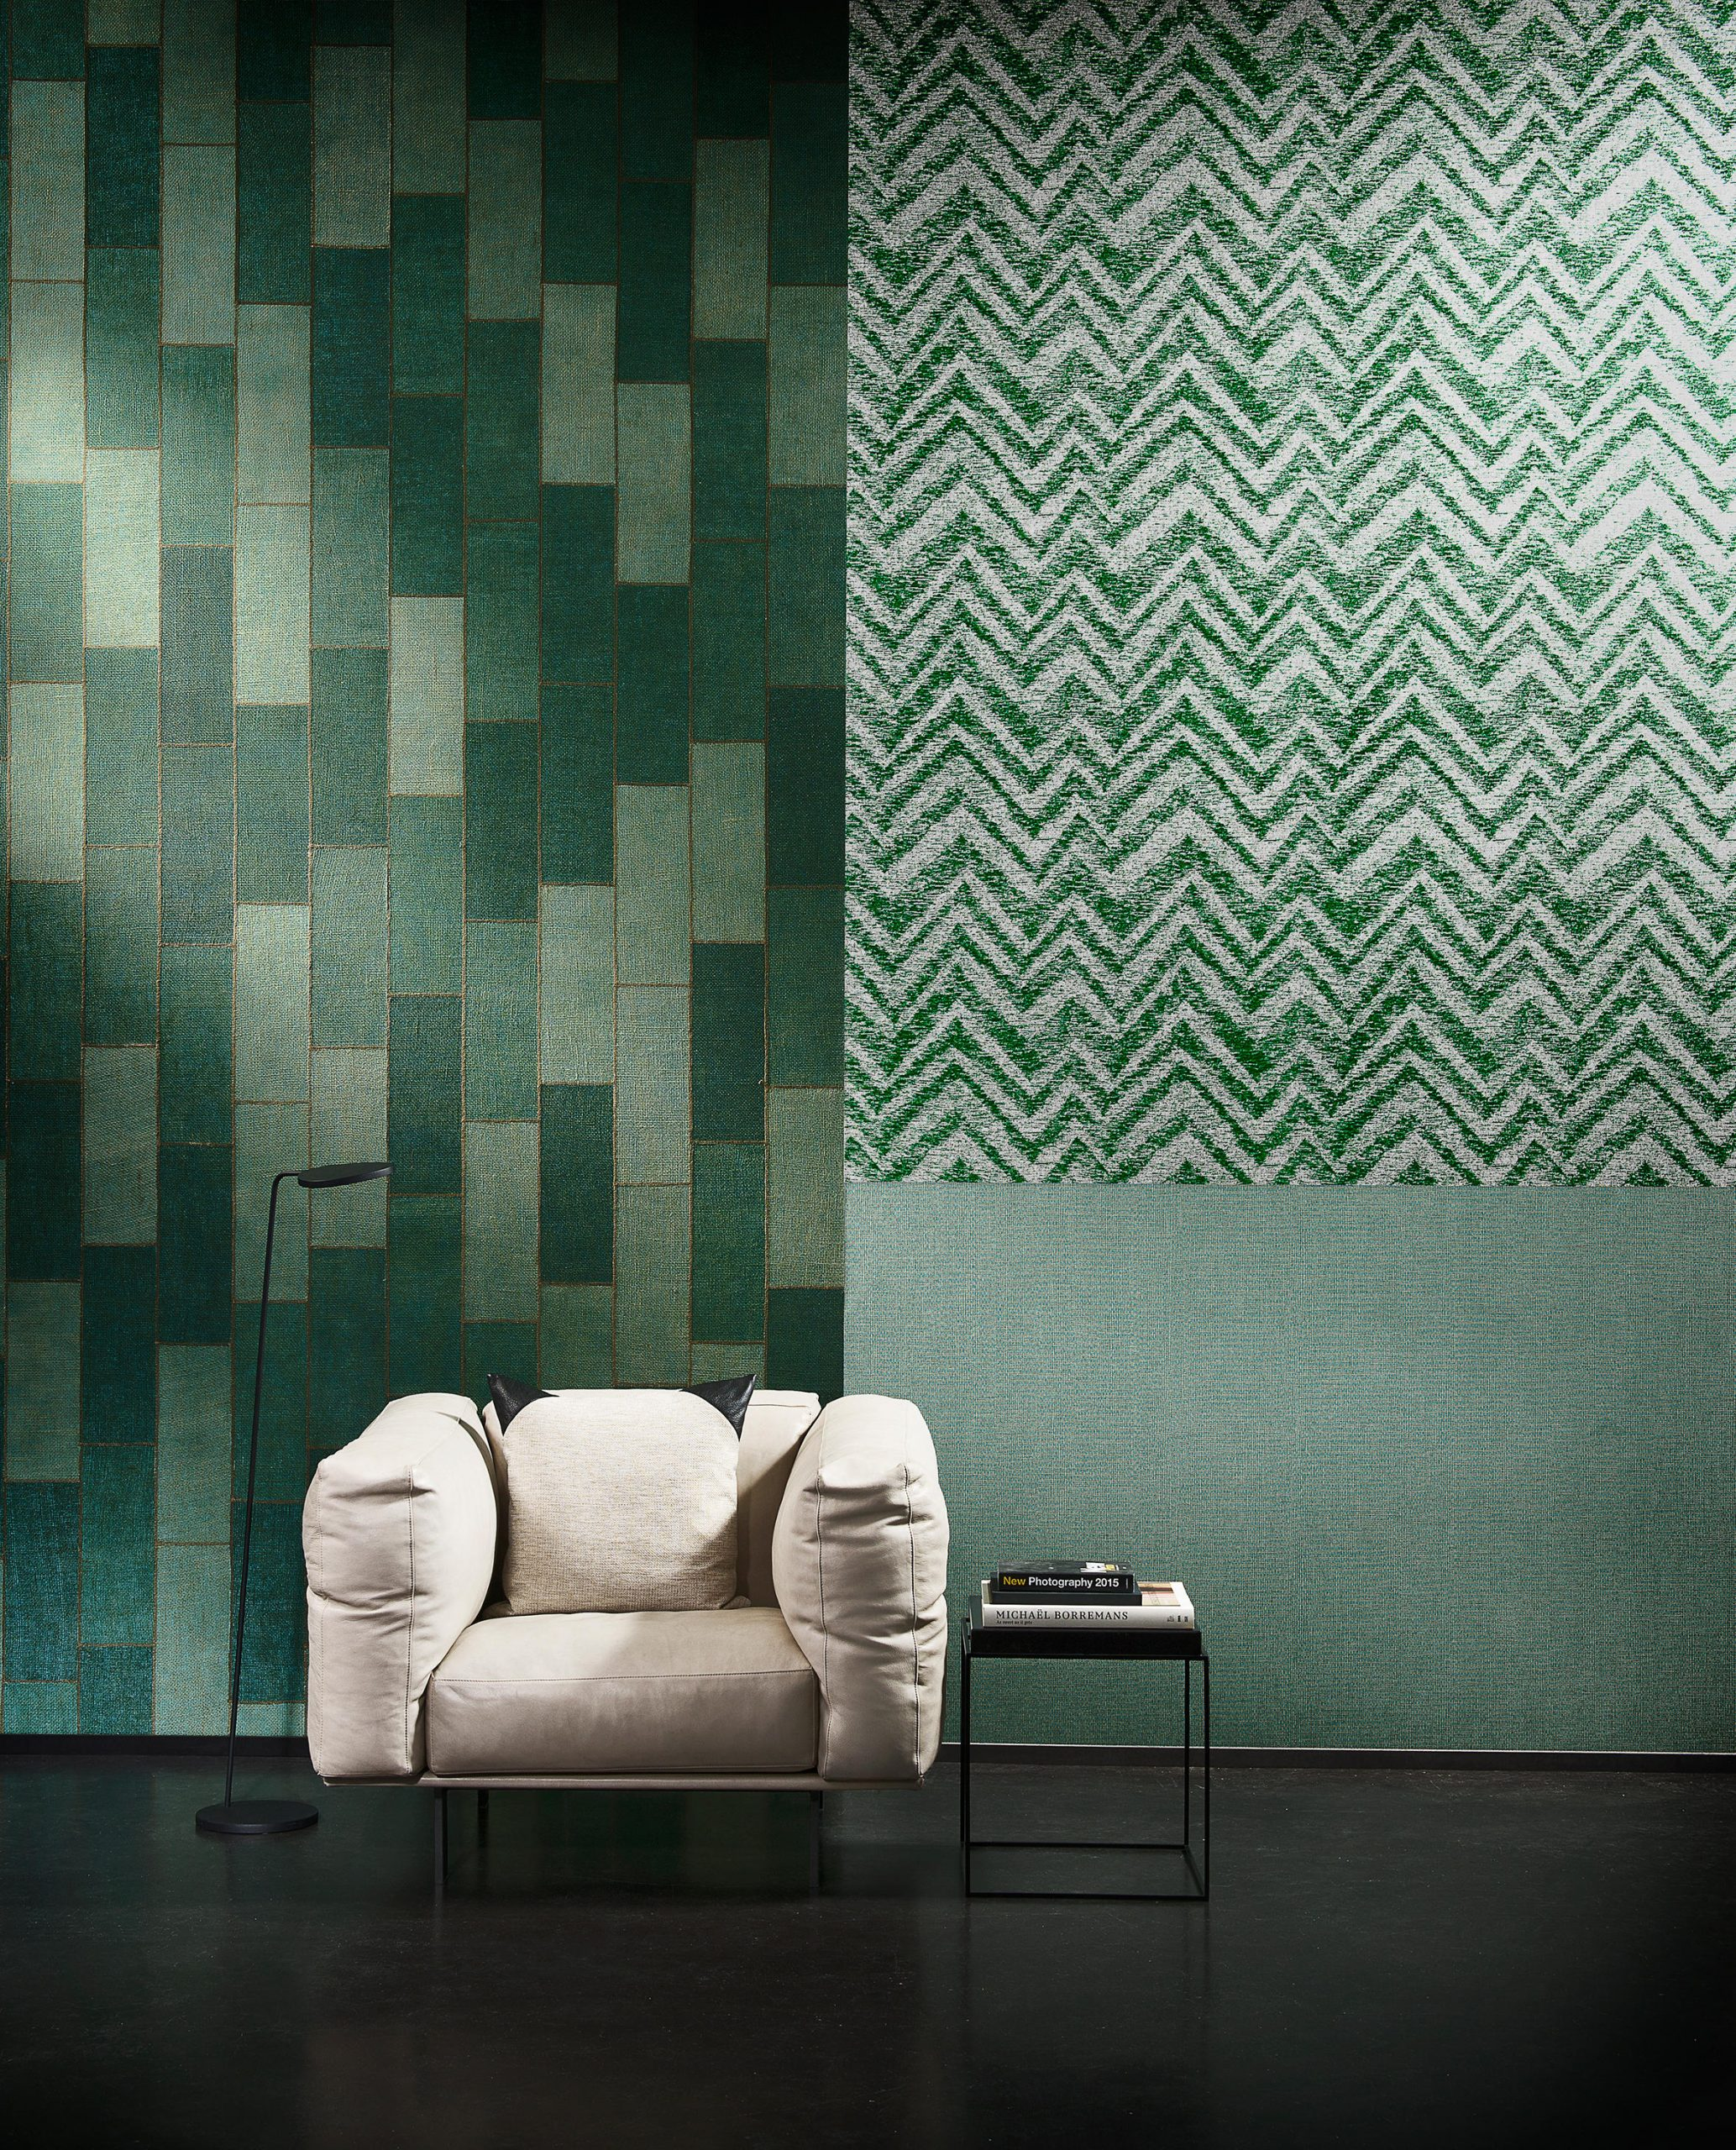 Revera Cadance - Wandbeläge / Tapeten Von Arte   Architonic intérieur Arte Design Factory 2.0